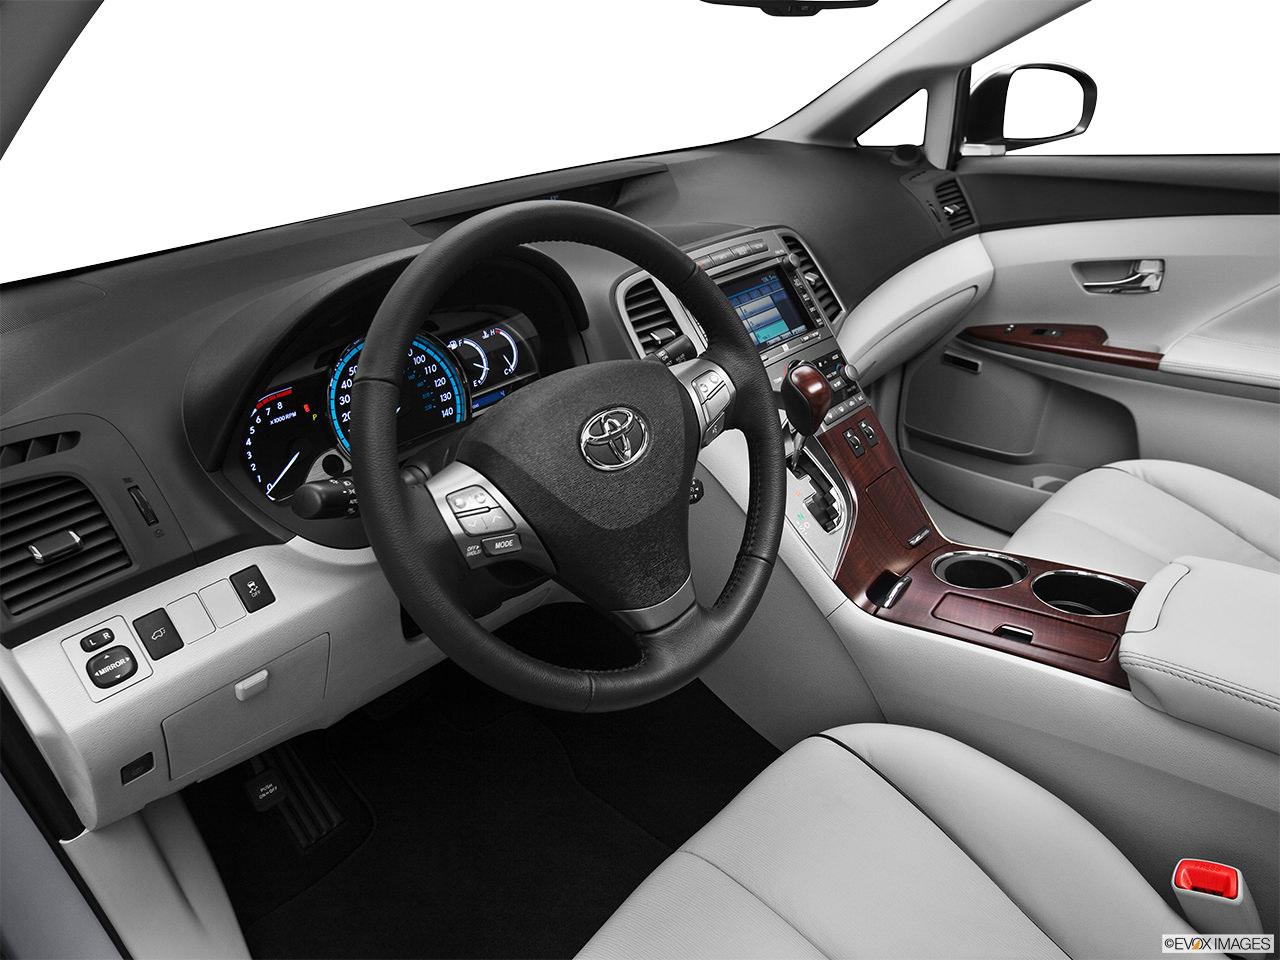 Toyota Venza 2012 Interior